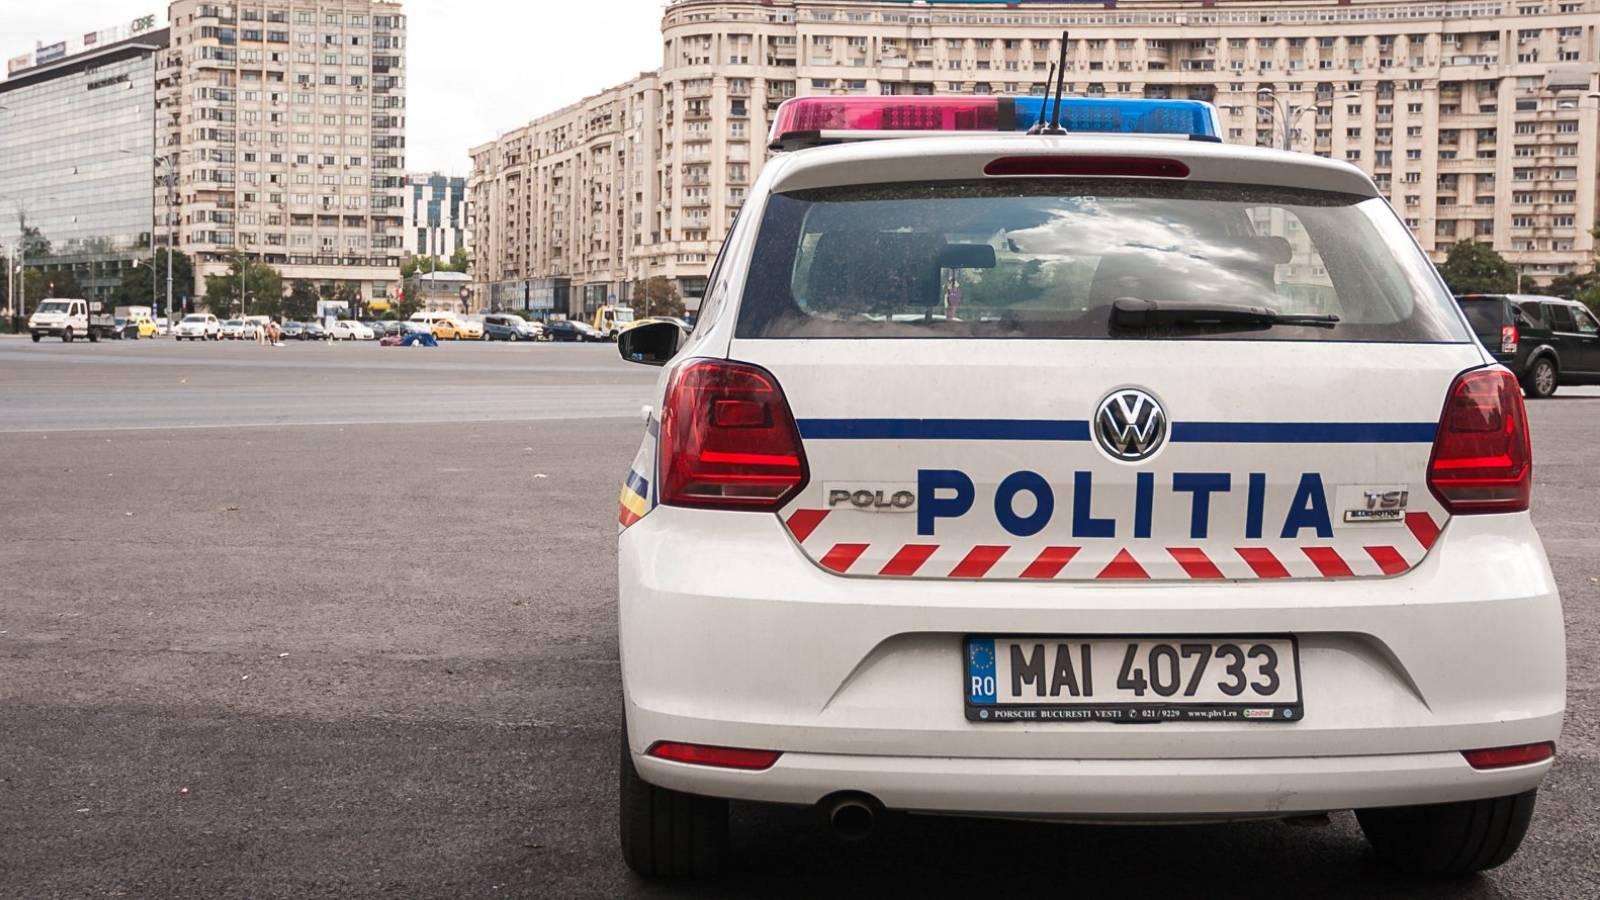 Politia Romana Multe Sanctiuni Noi din cauza Nerespectarii Masurilor Coronavirus